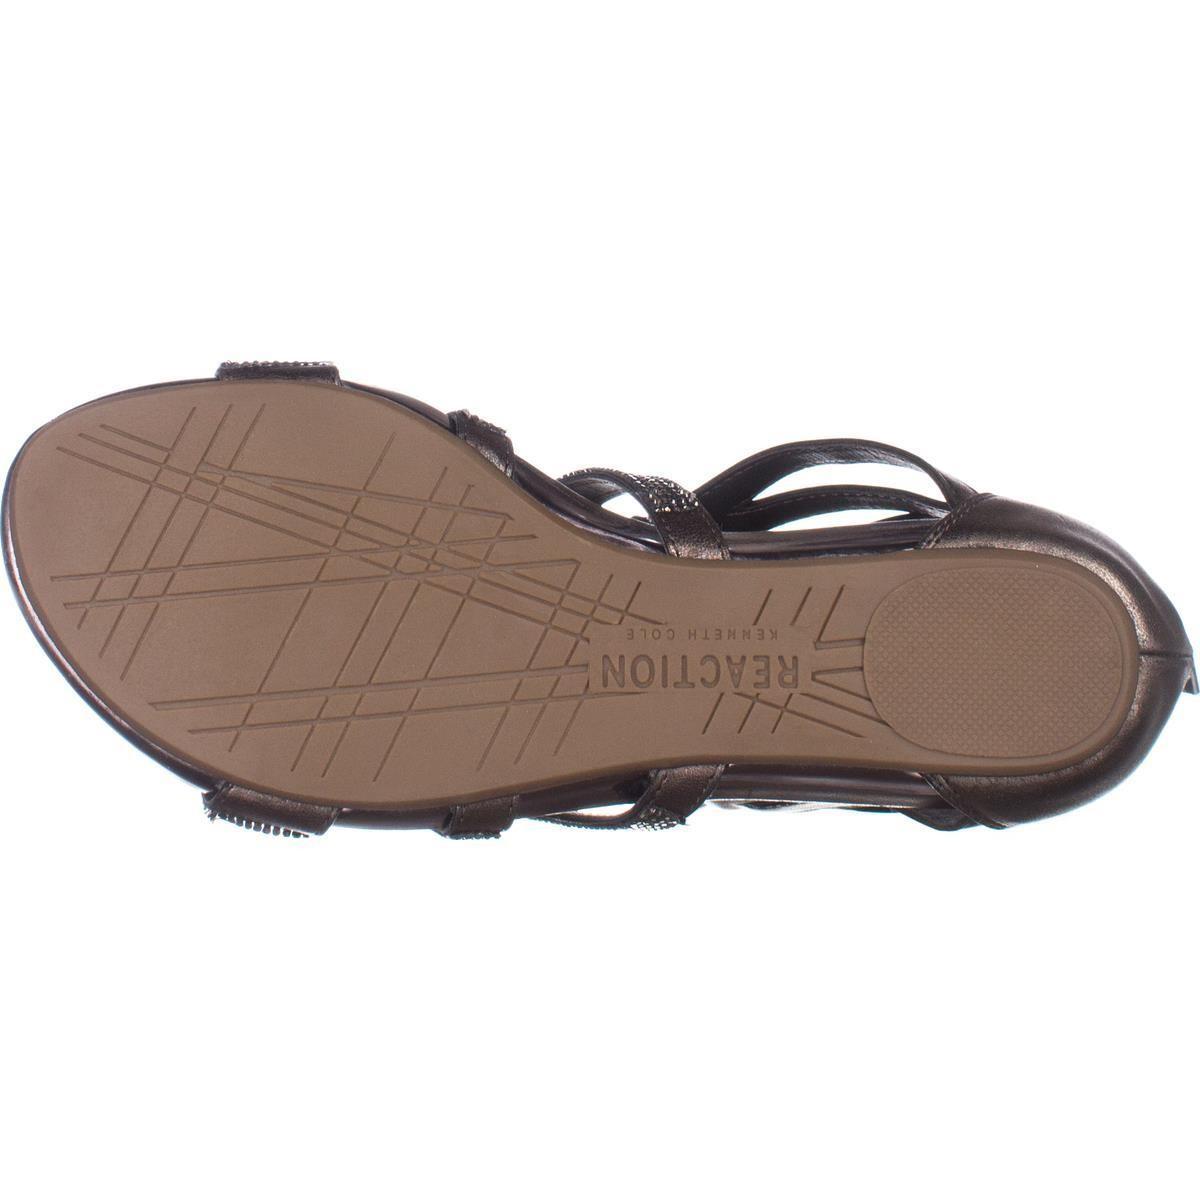 Carvela Lassie Flat Slipper Shoes